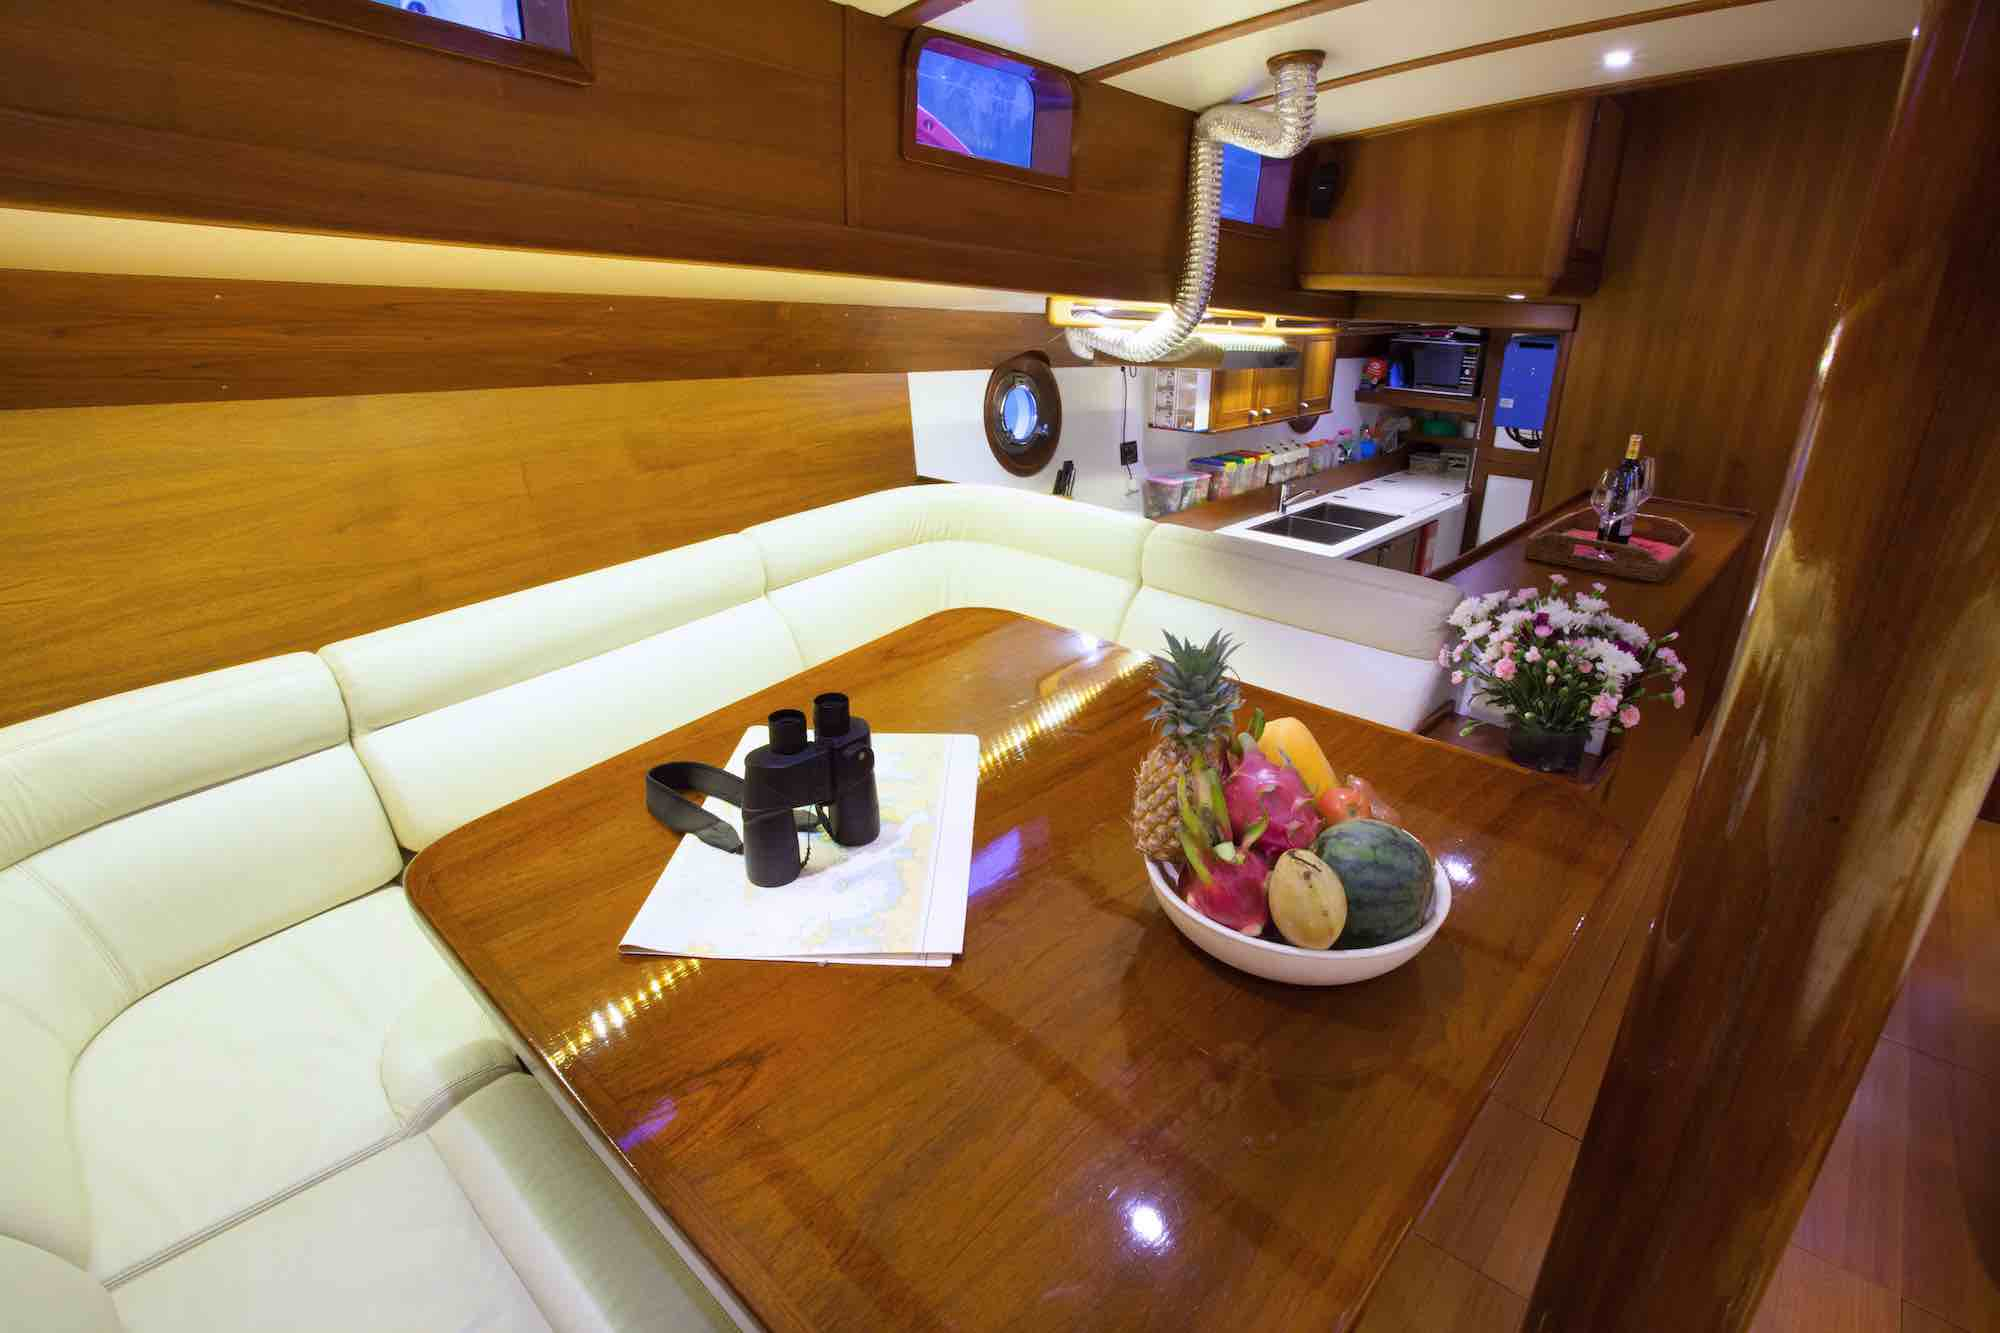 Jubilaeum_lounge area-fruit flower and telescope closeup sailing holiday in Mergui_XS.jpeg